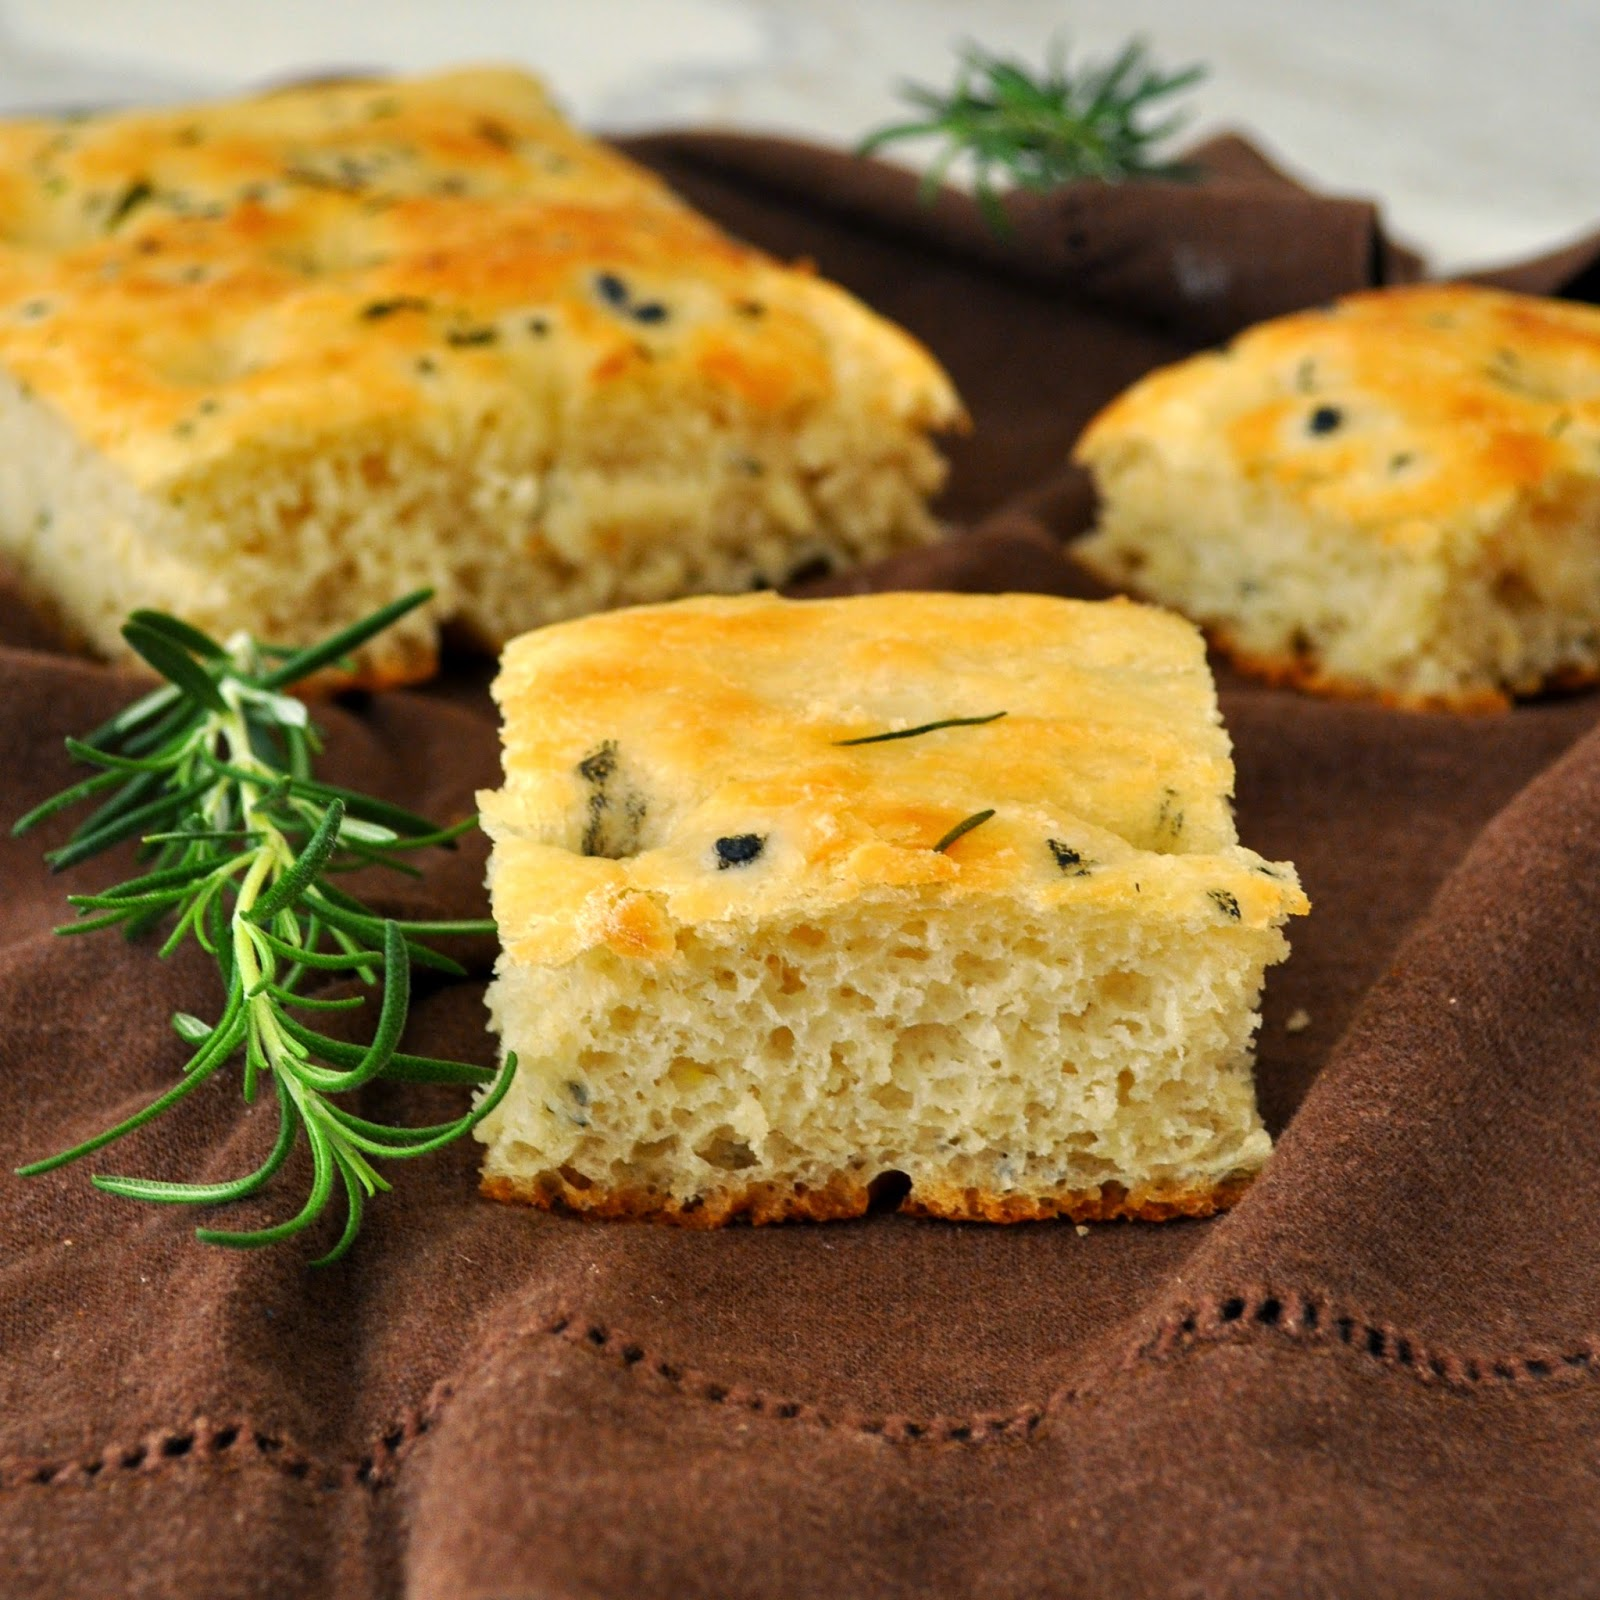 ... Manuela: Homemade Traditional Italian Focaccia Bread with Rosemary